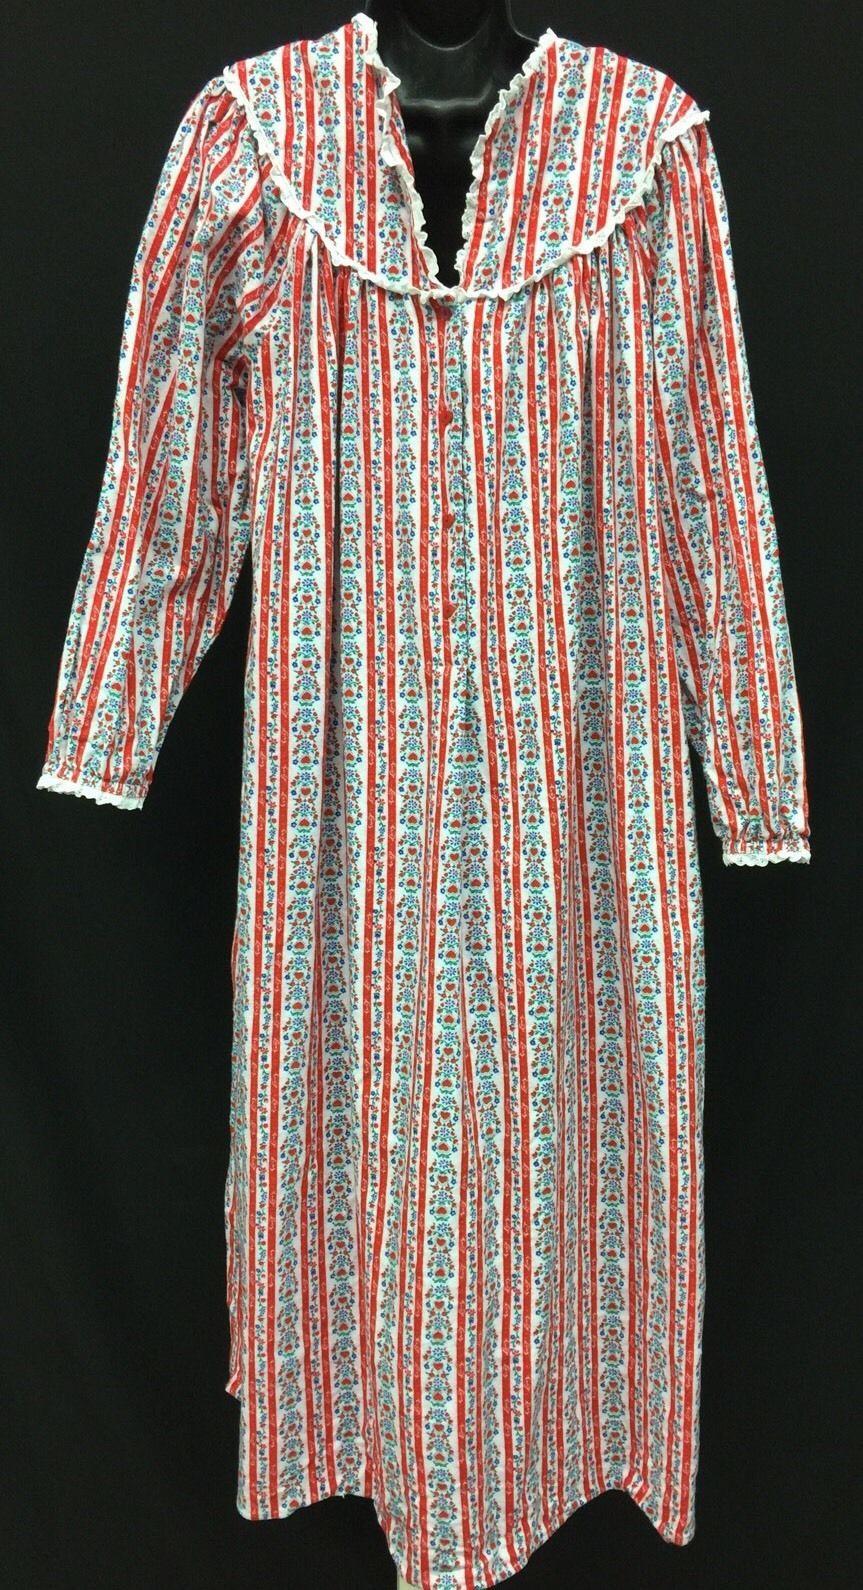 Lanz Of Salzburg Nightgown: 3 listings